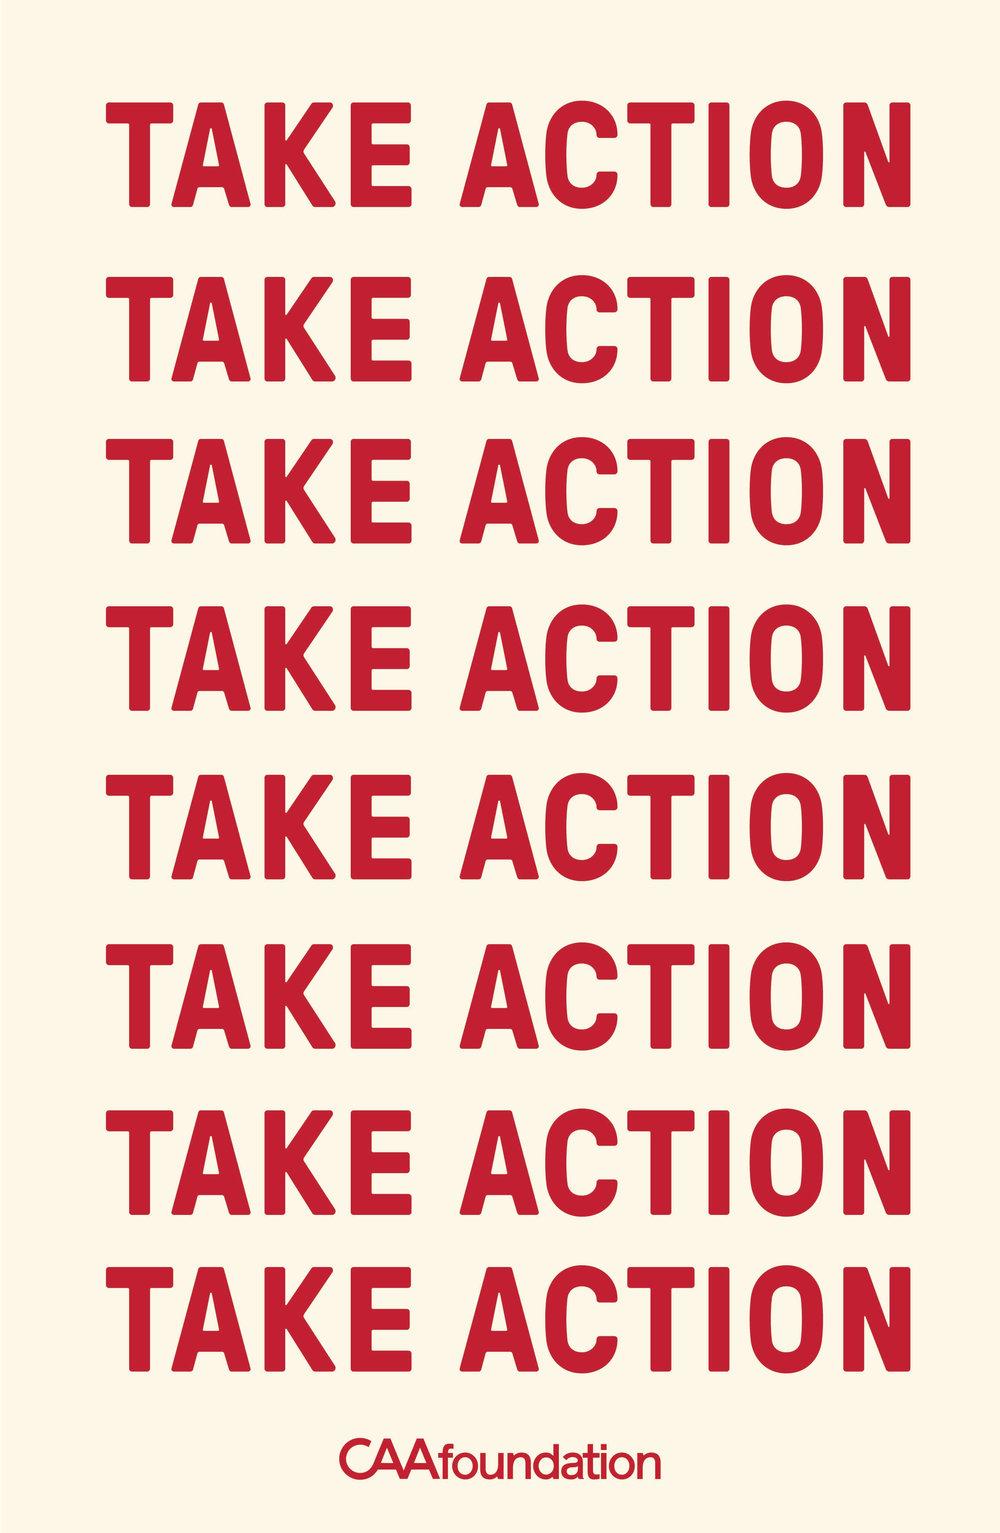 Take_Action_Posters_v5-17.jpg